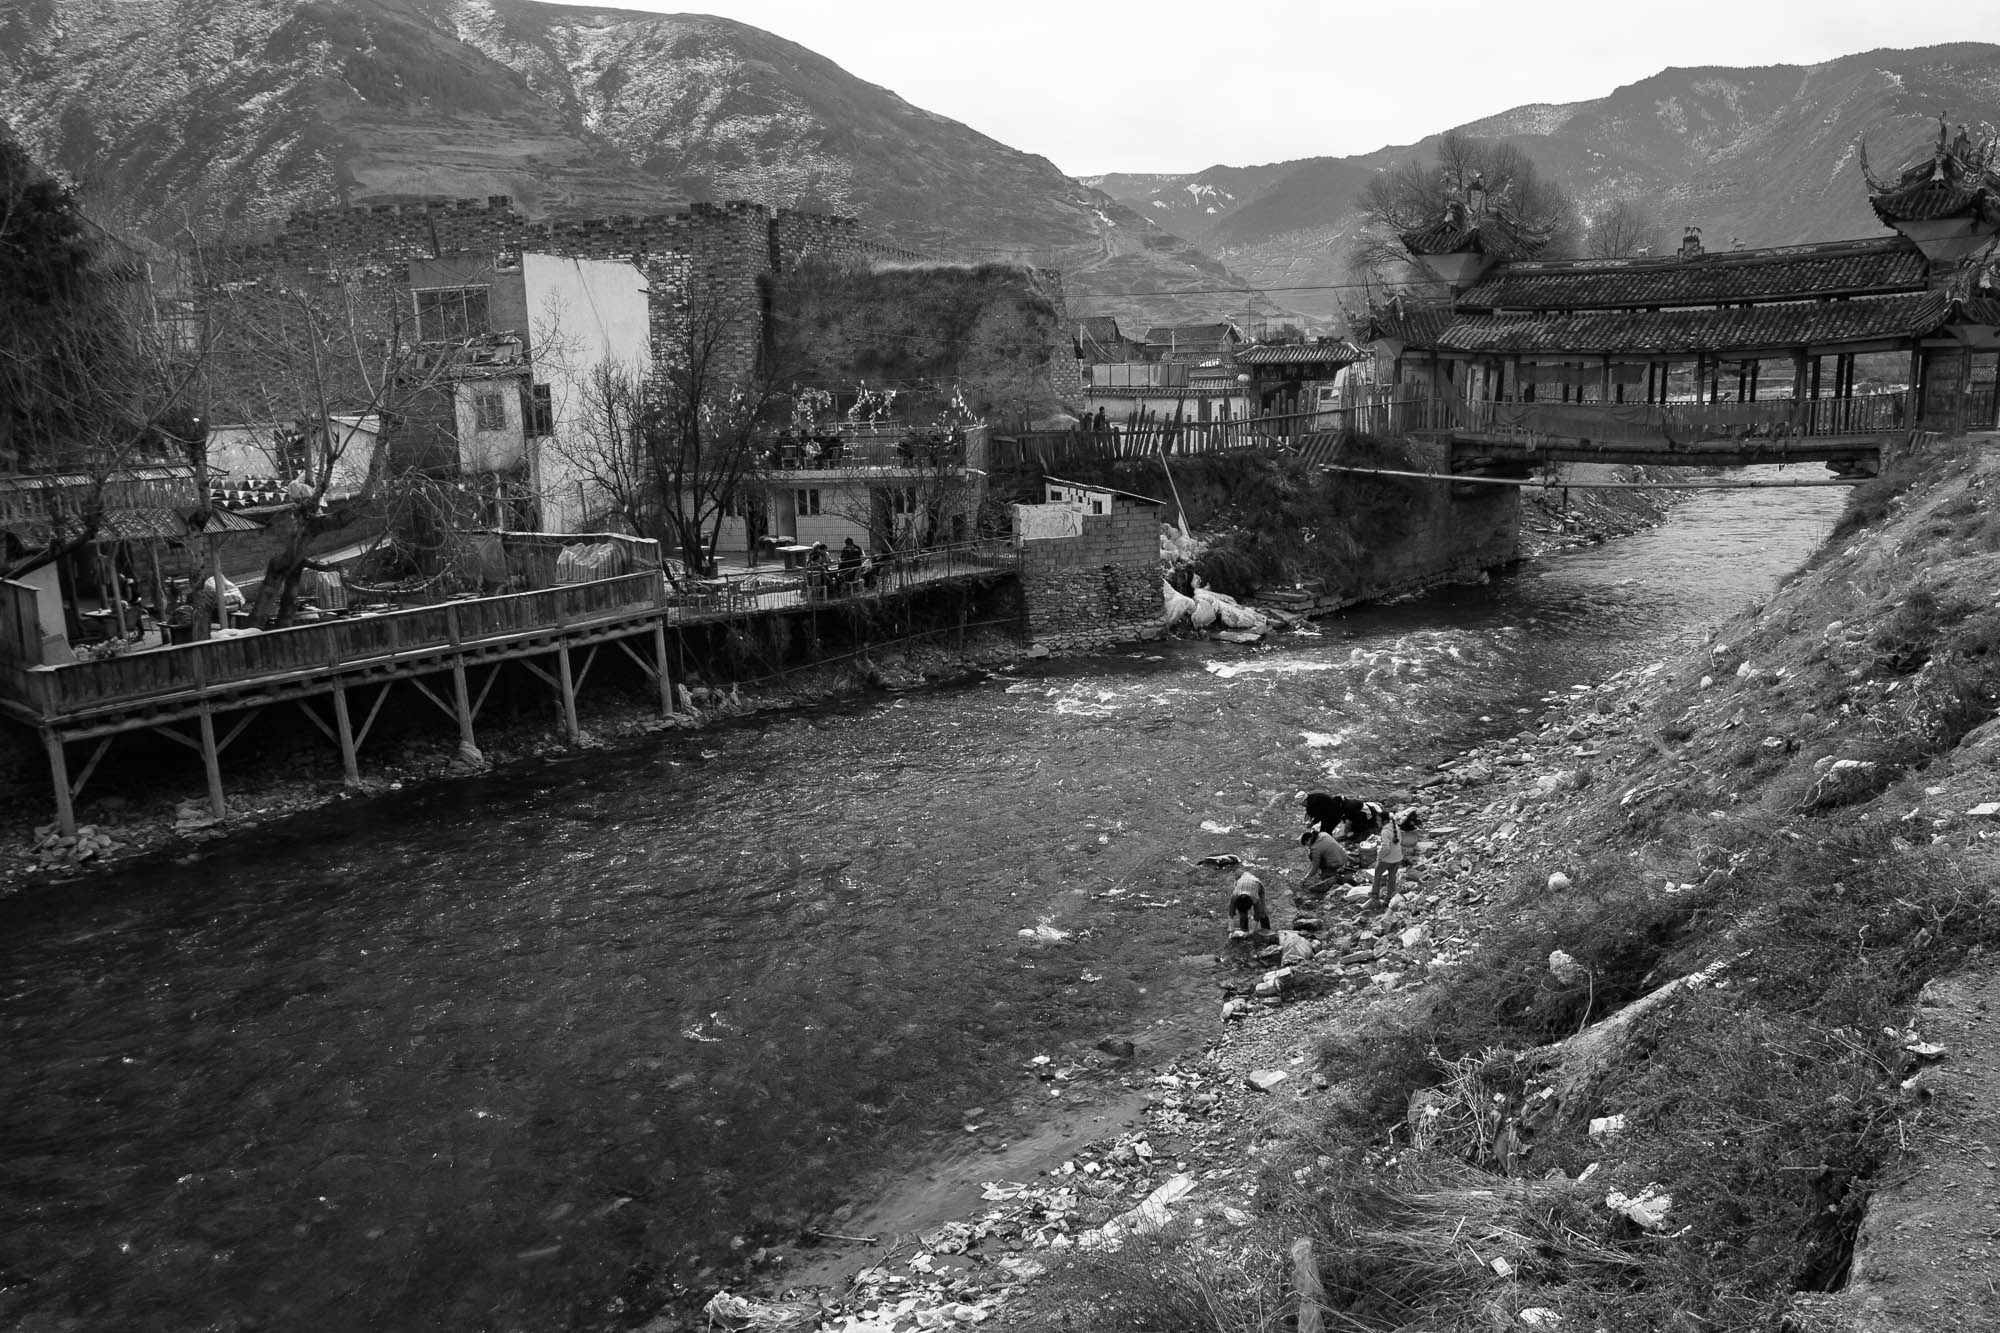 Sichuan 2006 river